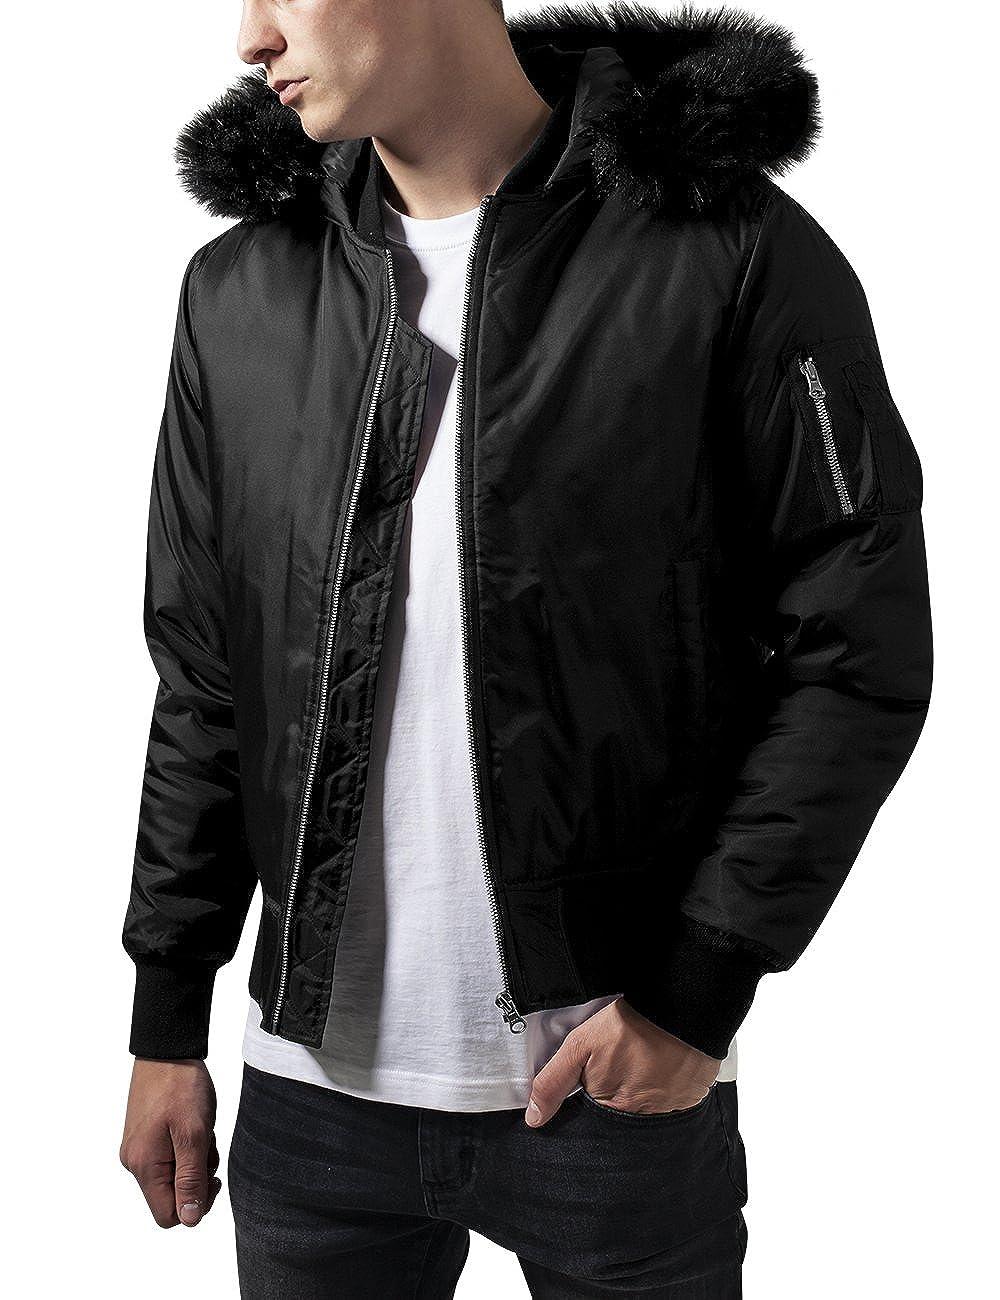 Urban Classics Hooded Basic Bomber Jacket Chaqueta para Hombre